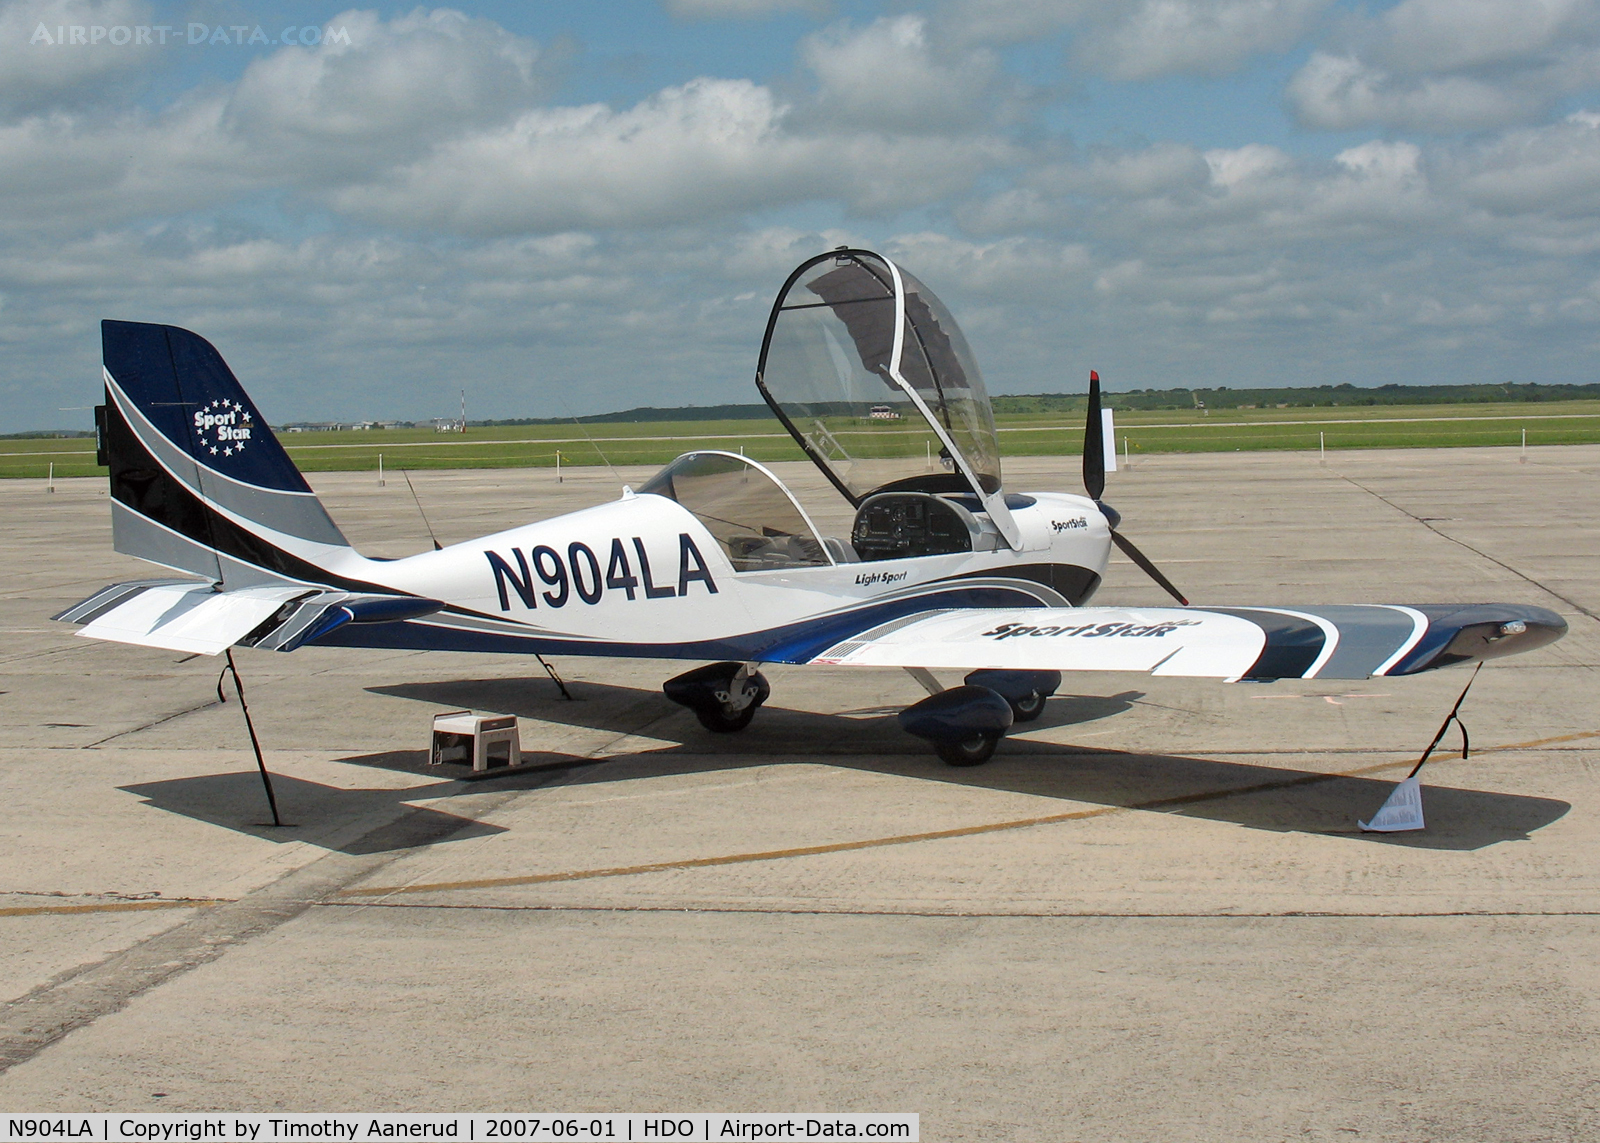 N904LA, 2007 Evektor-Aerotechnik Sportstar C/N 20070904, The EAA Texas Fly-In